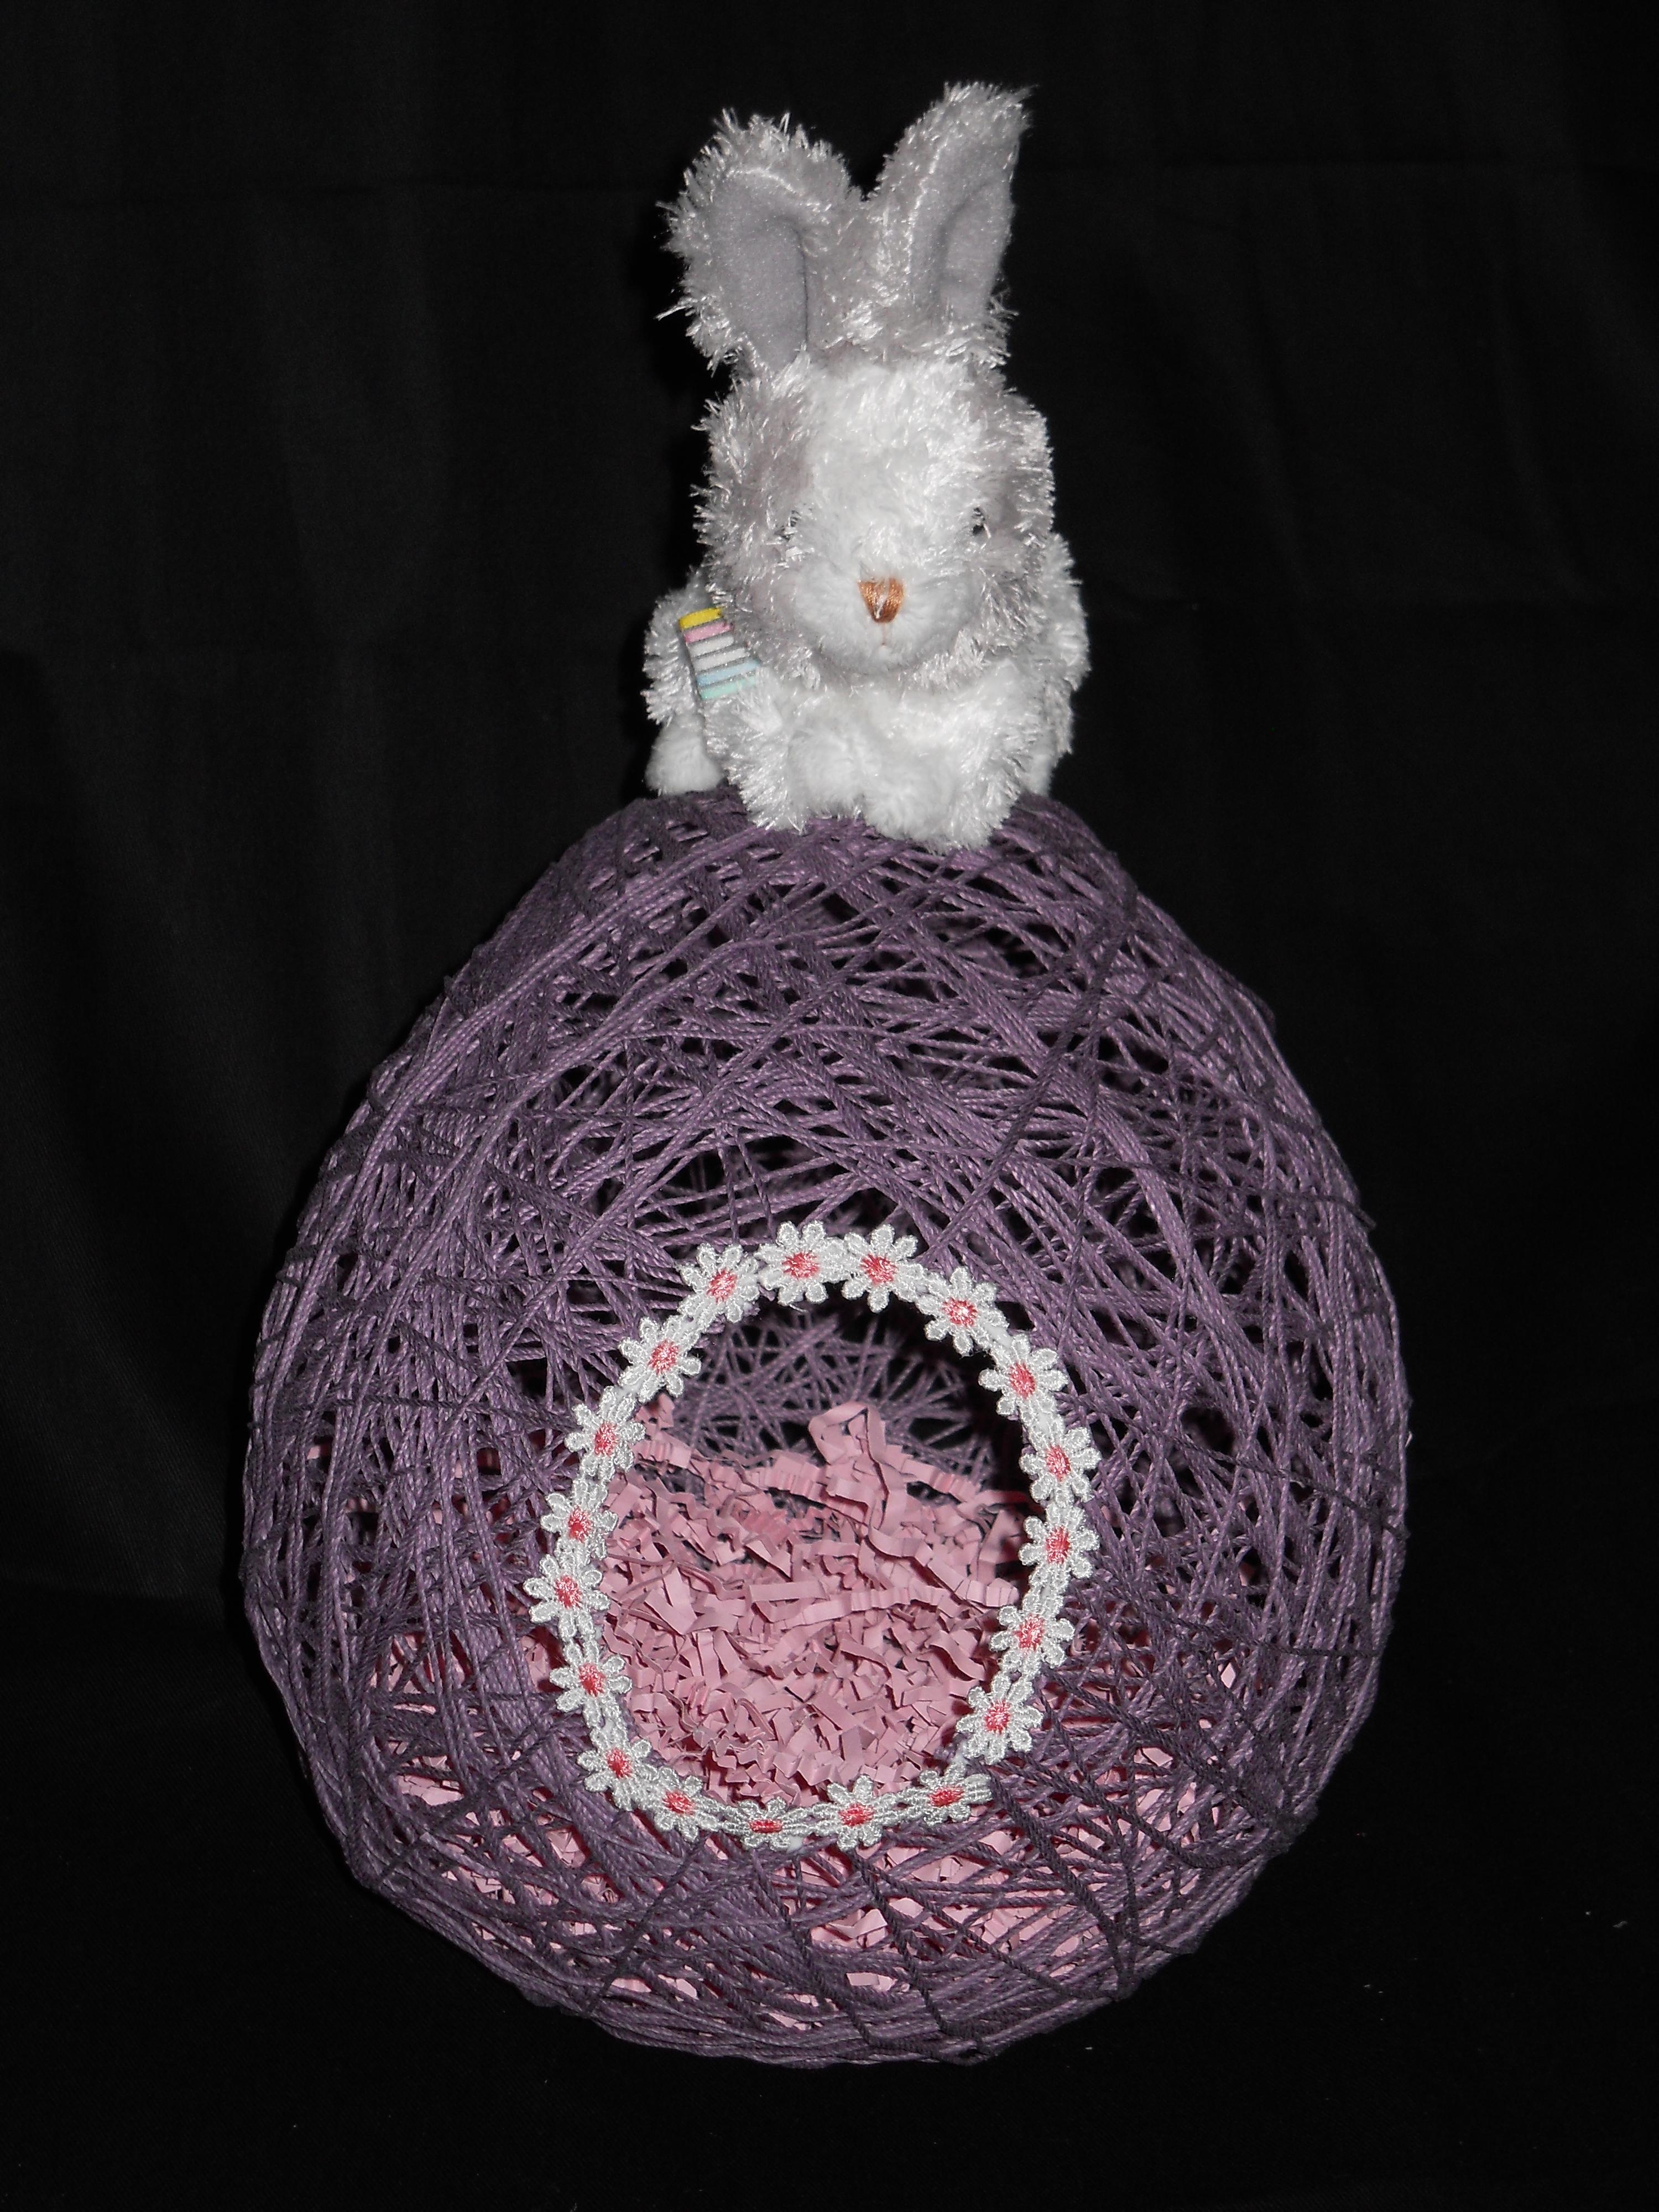 Easter Egg Decoration or Gift Craft